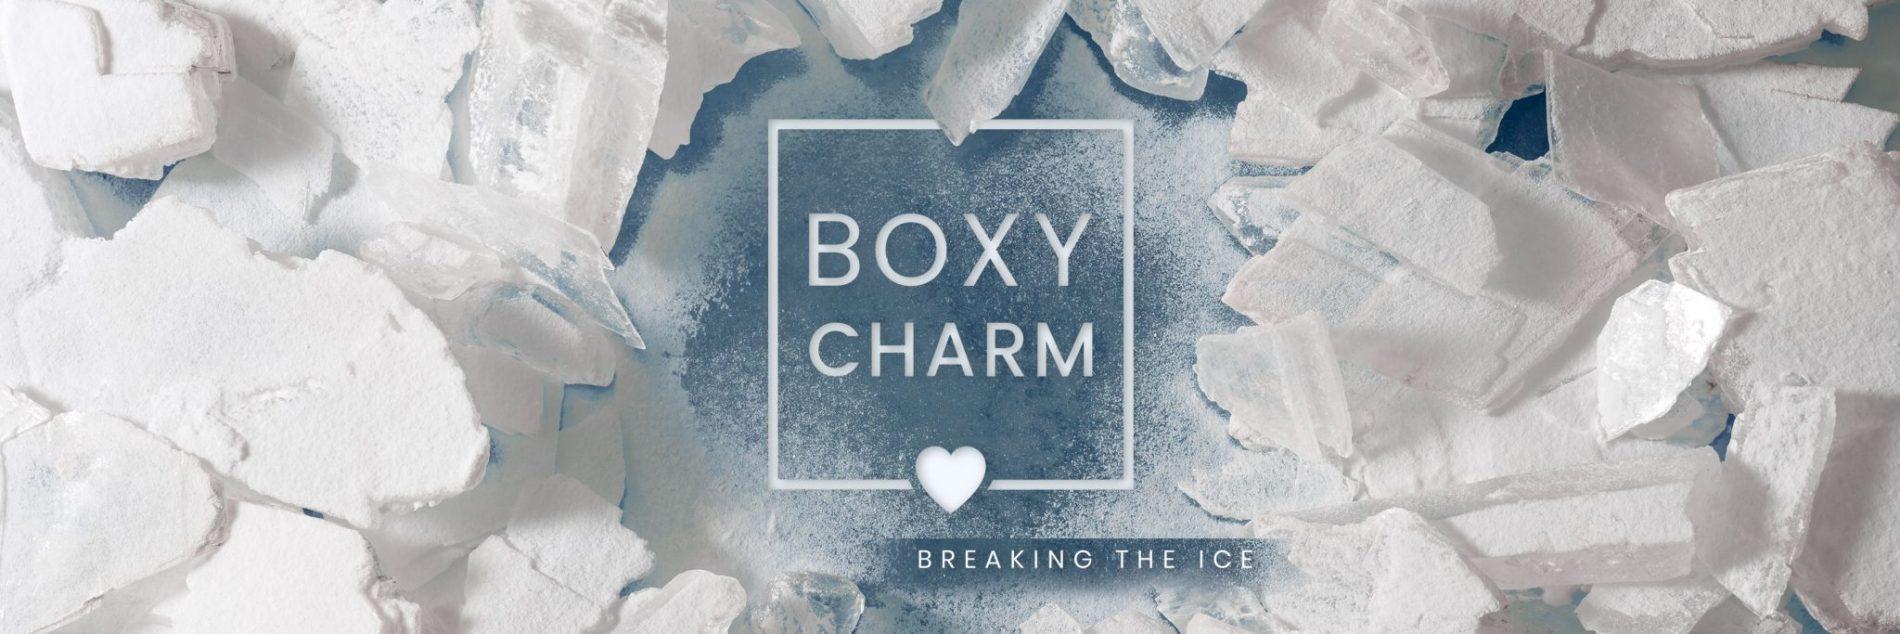 BOXYCHARM January 2020 FULL Spoilers!